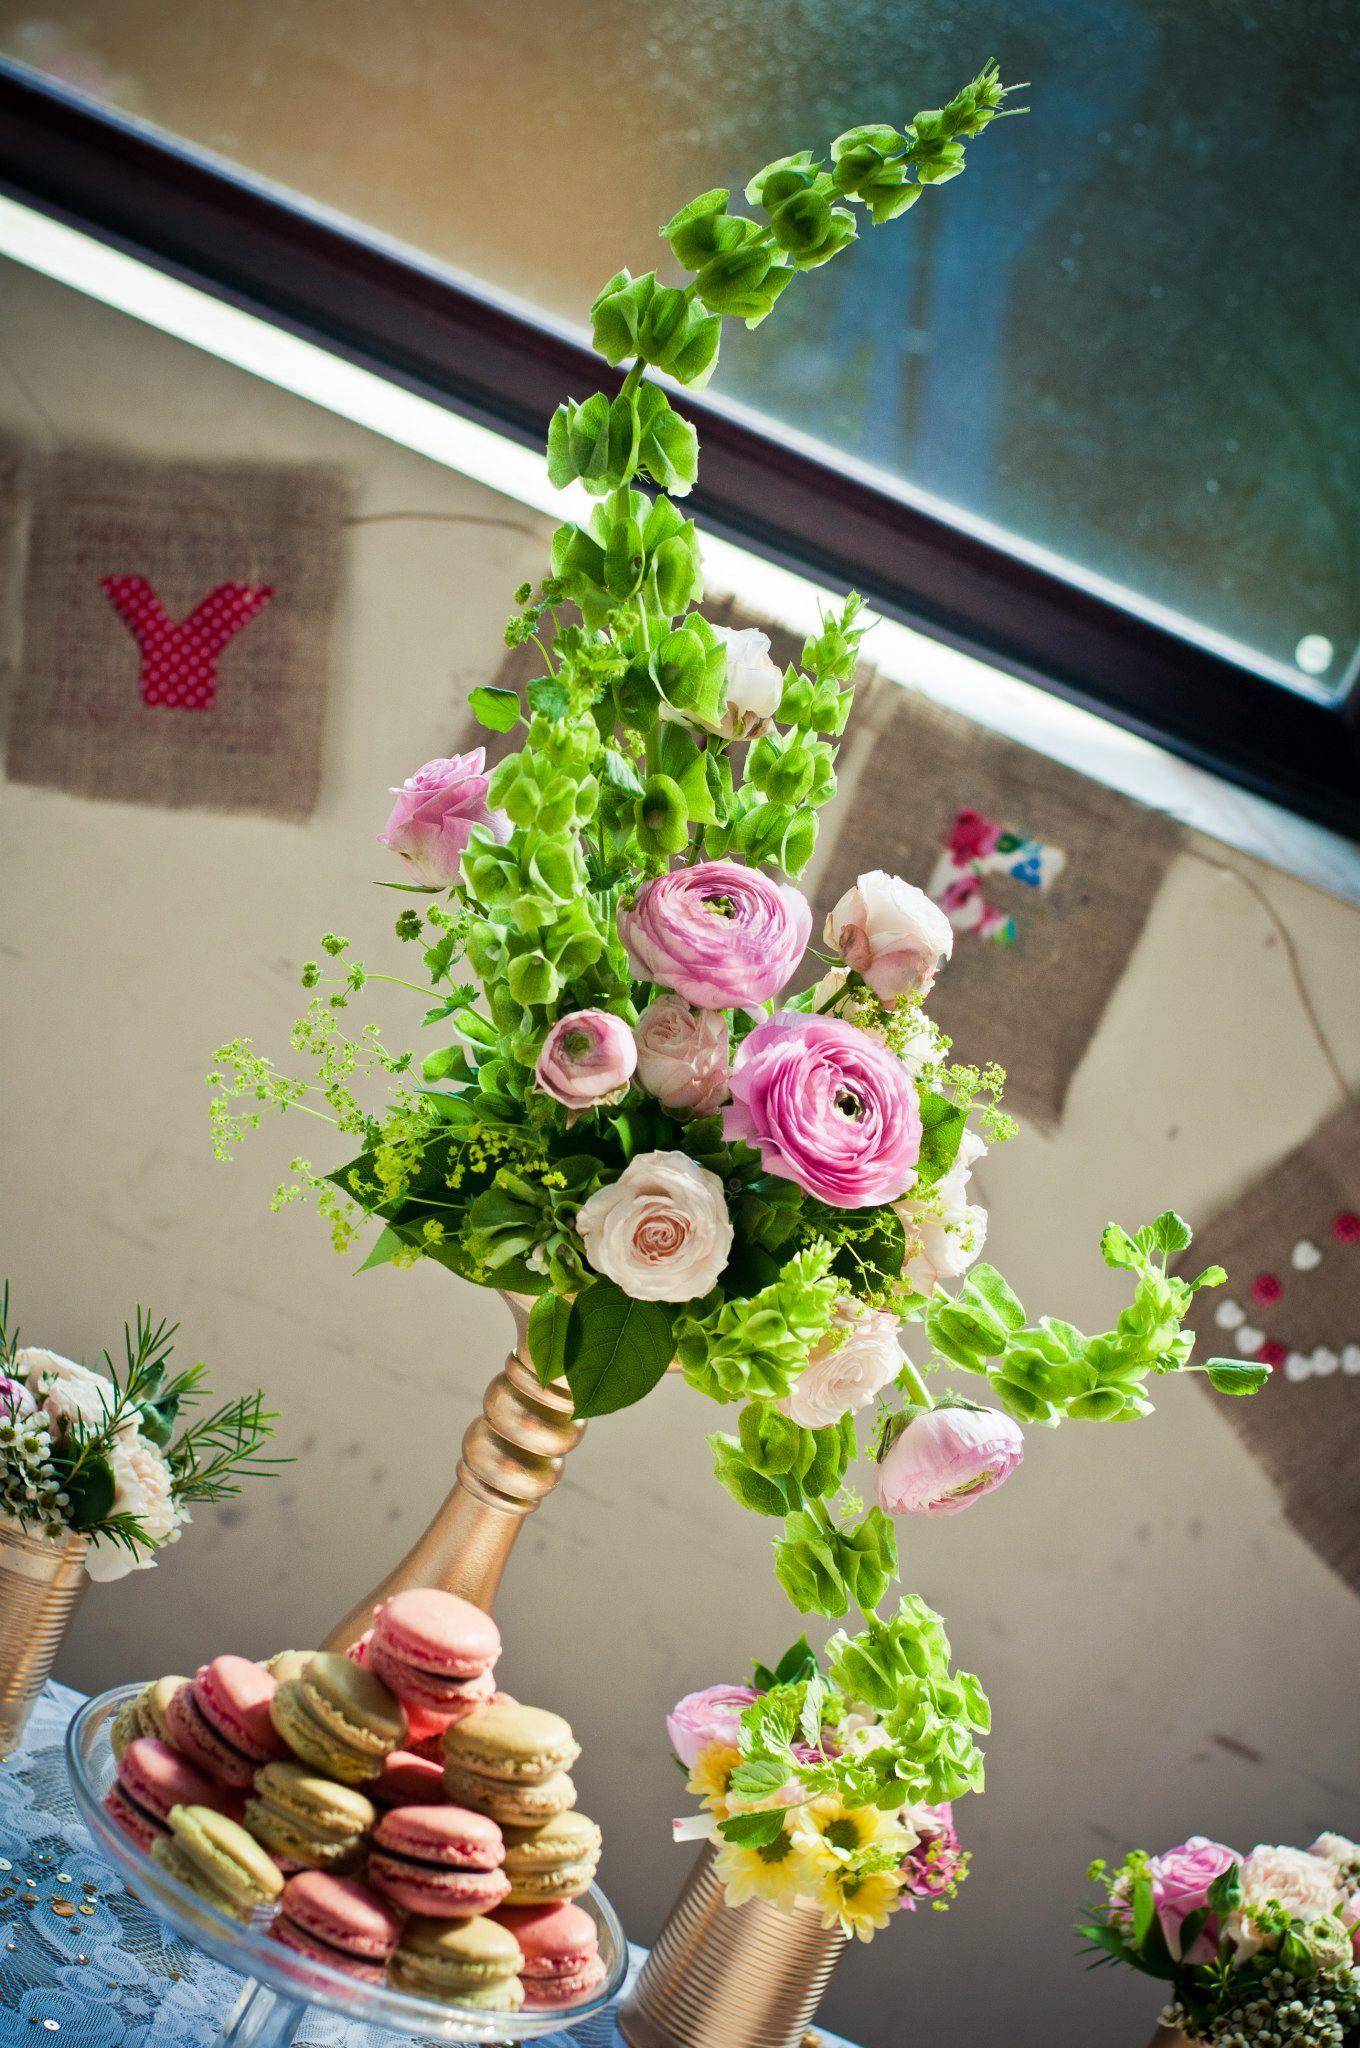 Hogarth Curve floral arrangement & Macarons Macarons